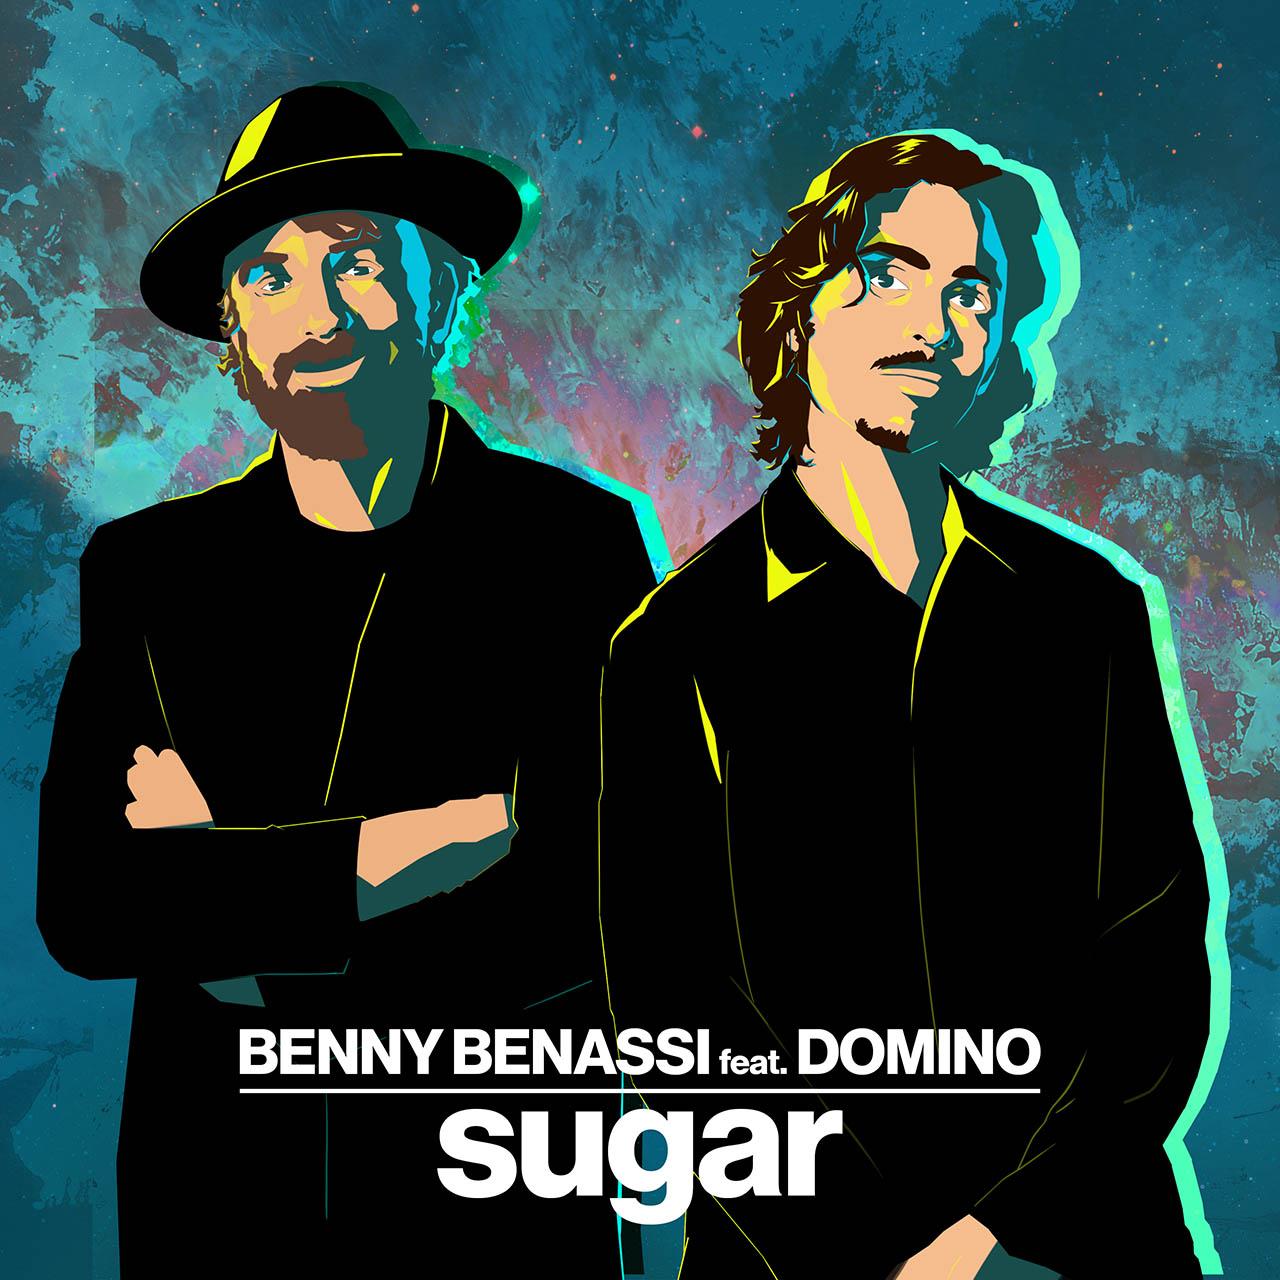 Benny Benassi feat Domino - Sugar